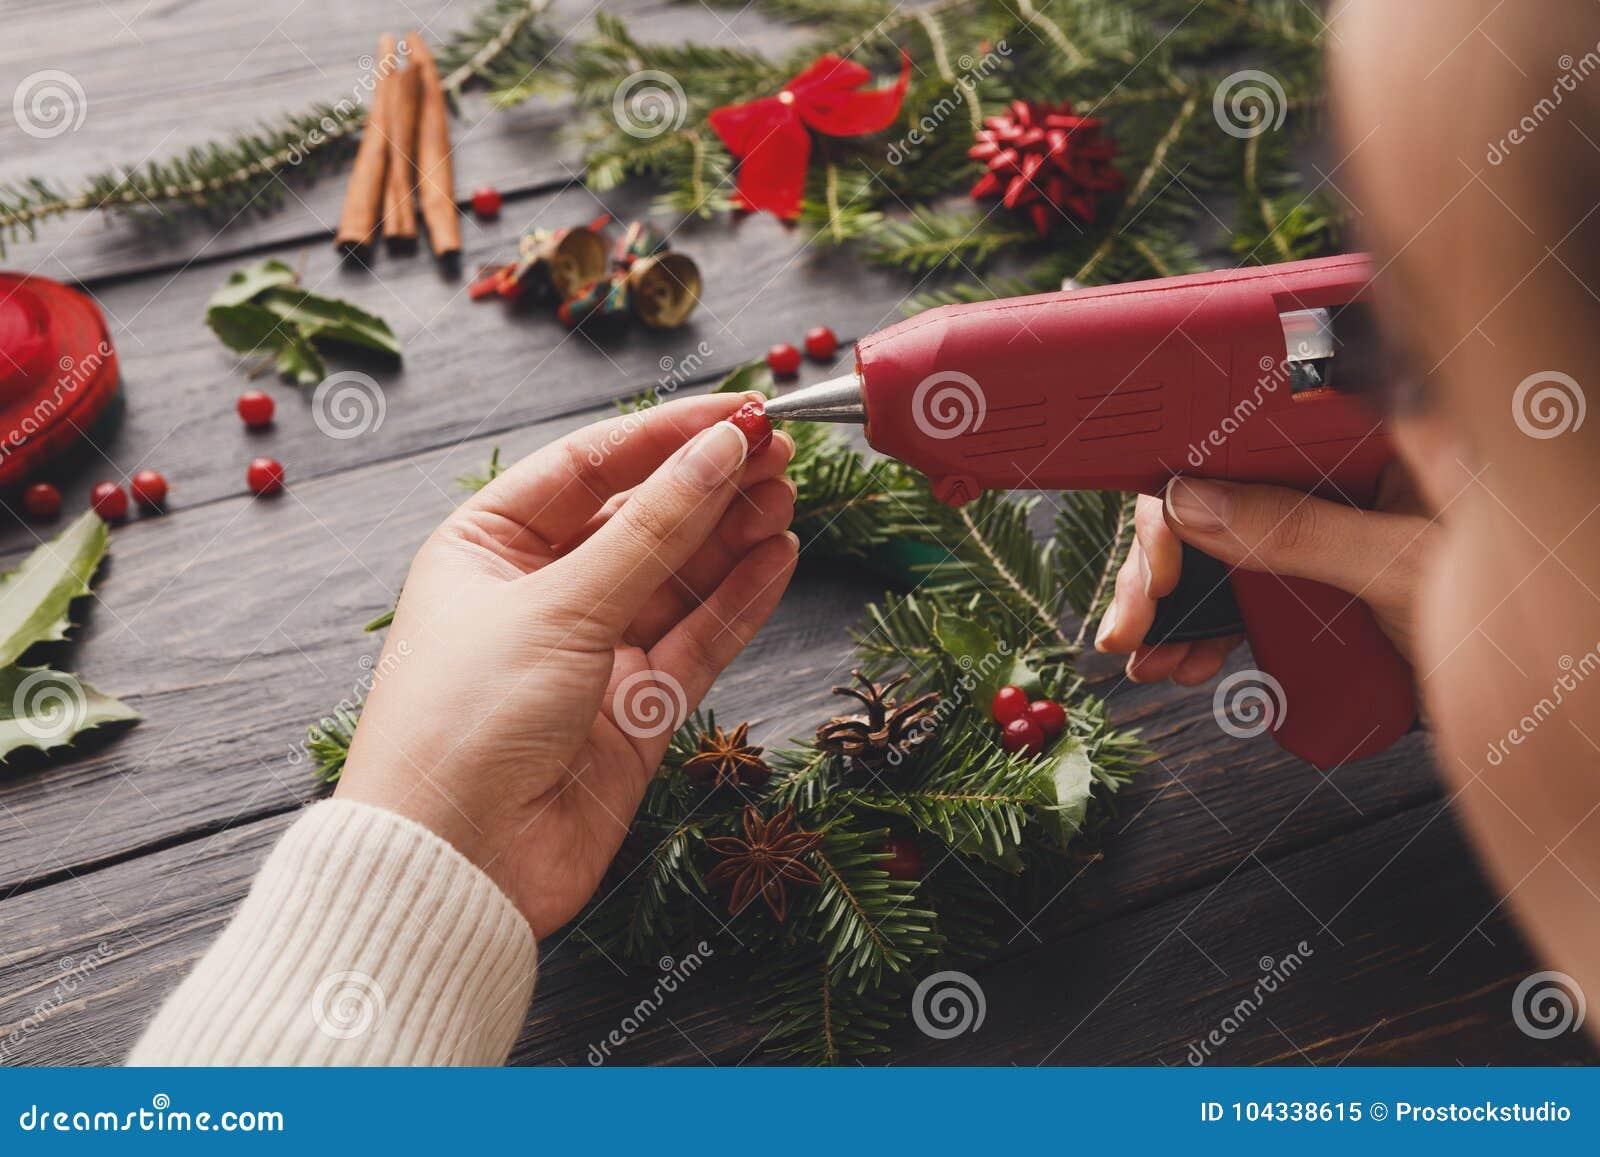 Creative Xmas Hobby Craft Wreath Making Christmas Wreath With Glue